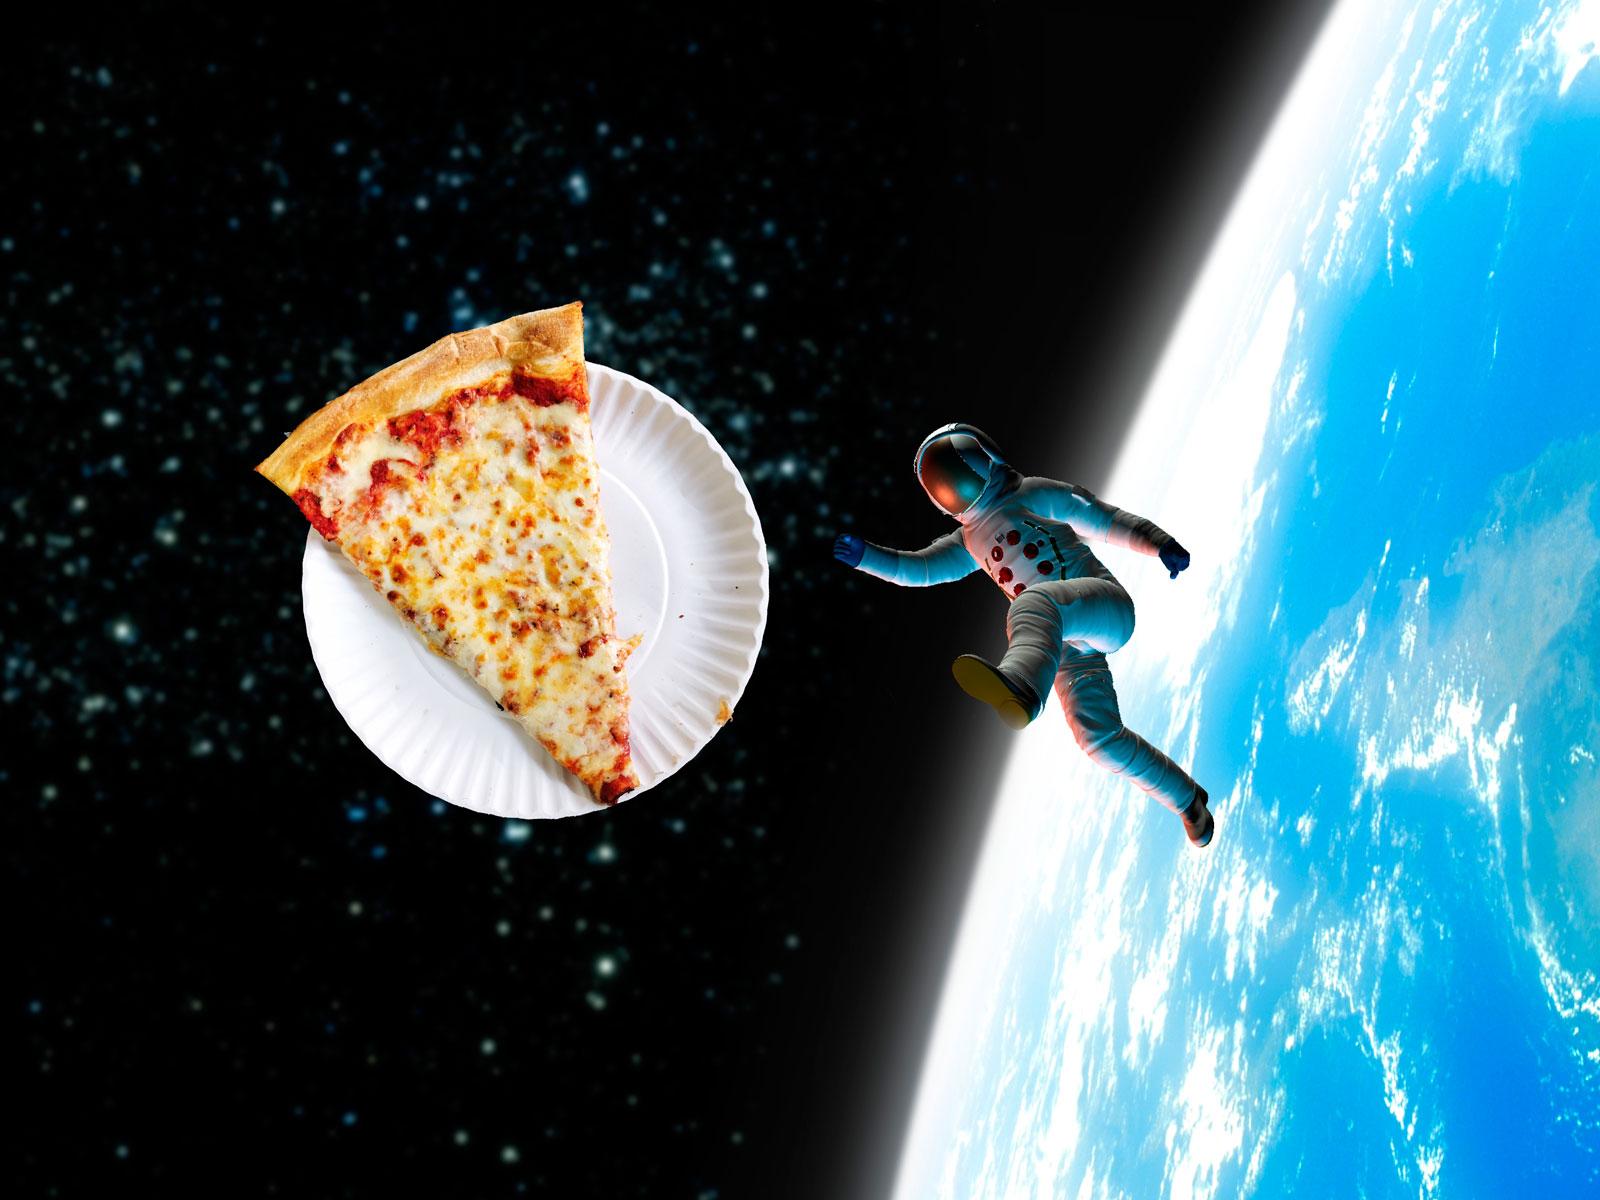 Astronaut Pizza